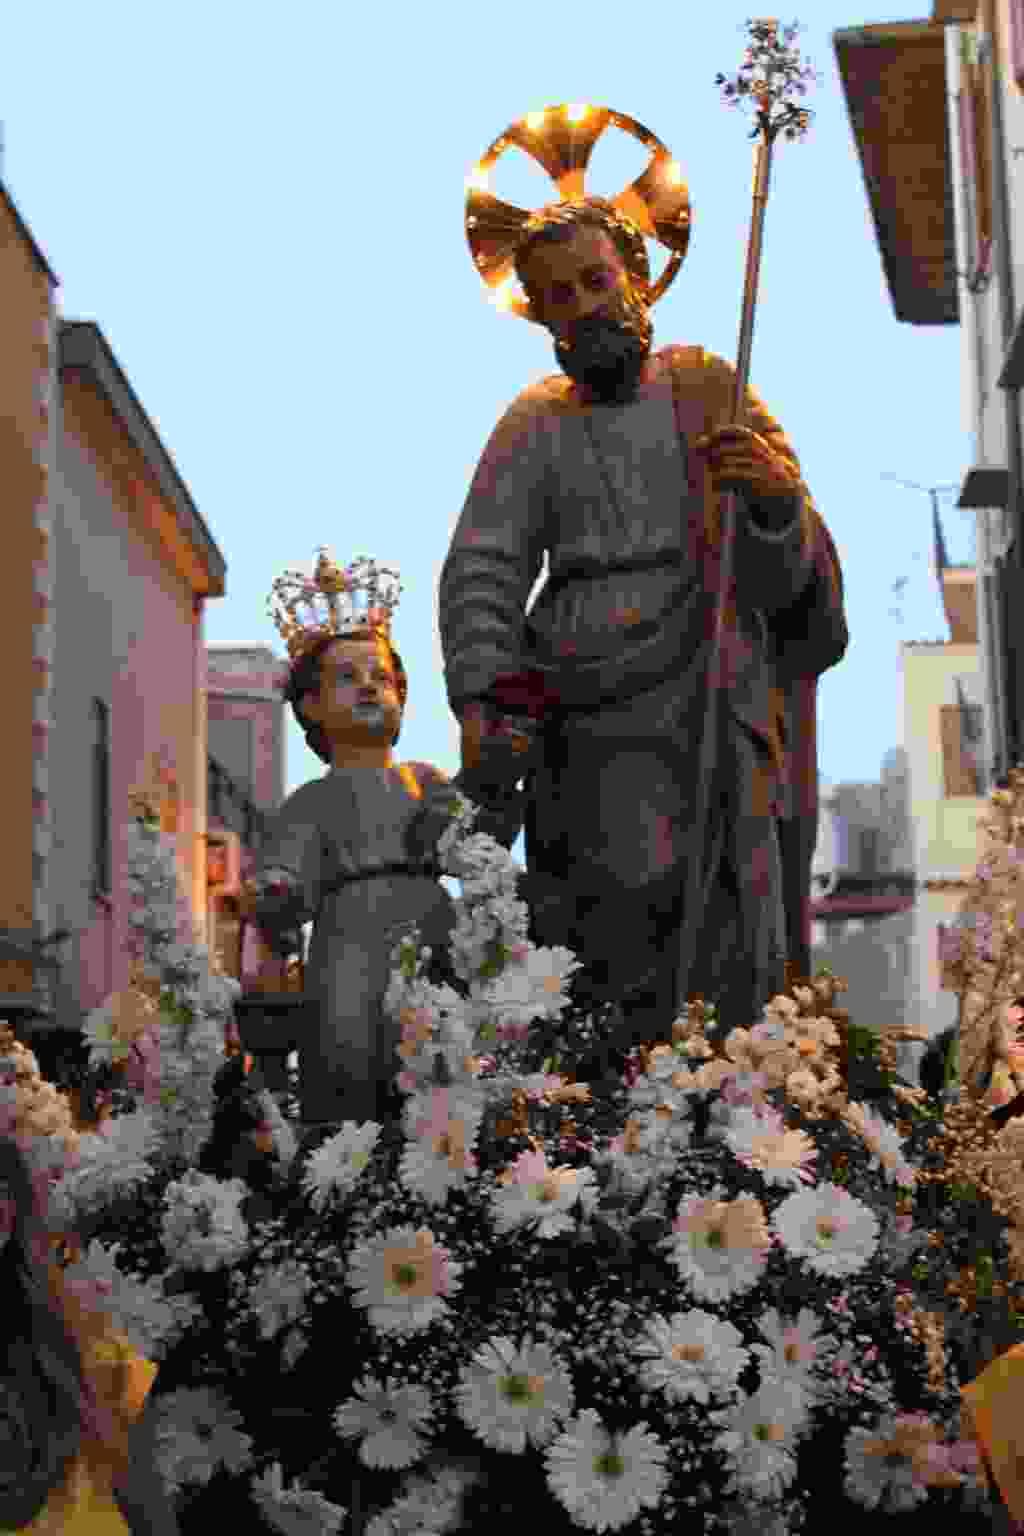 Festivit� di San Giuseppe ,anno 2013.